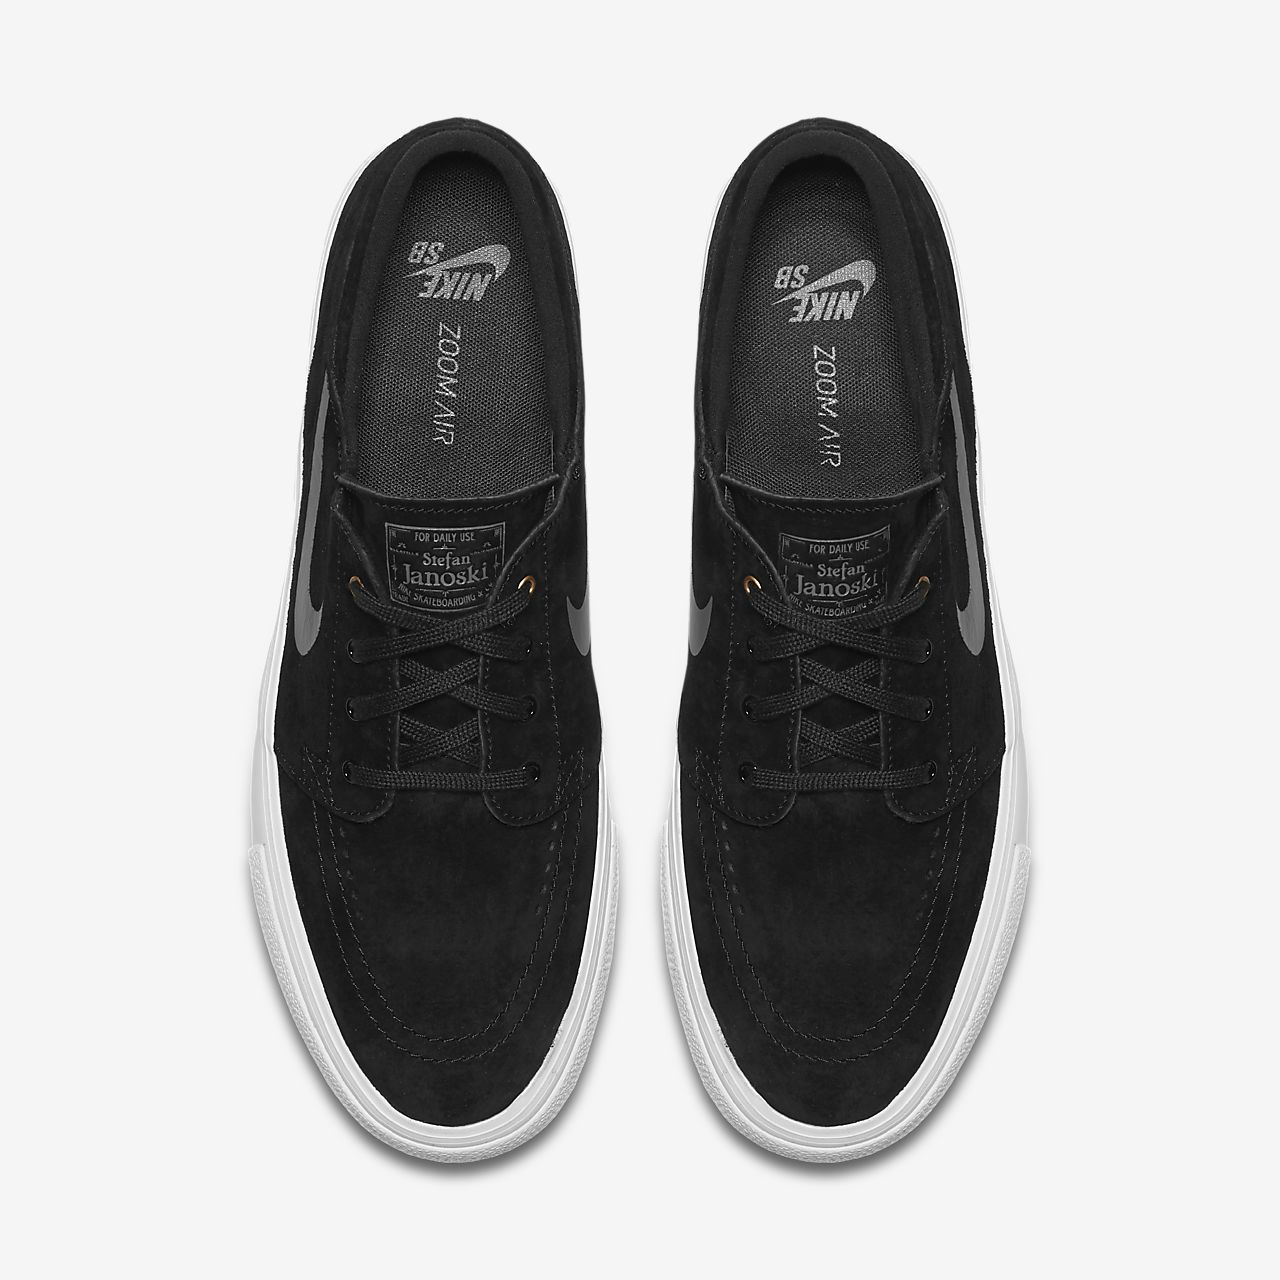 a09323d6f30 stefan janoski shoes   OFF61% Discounts